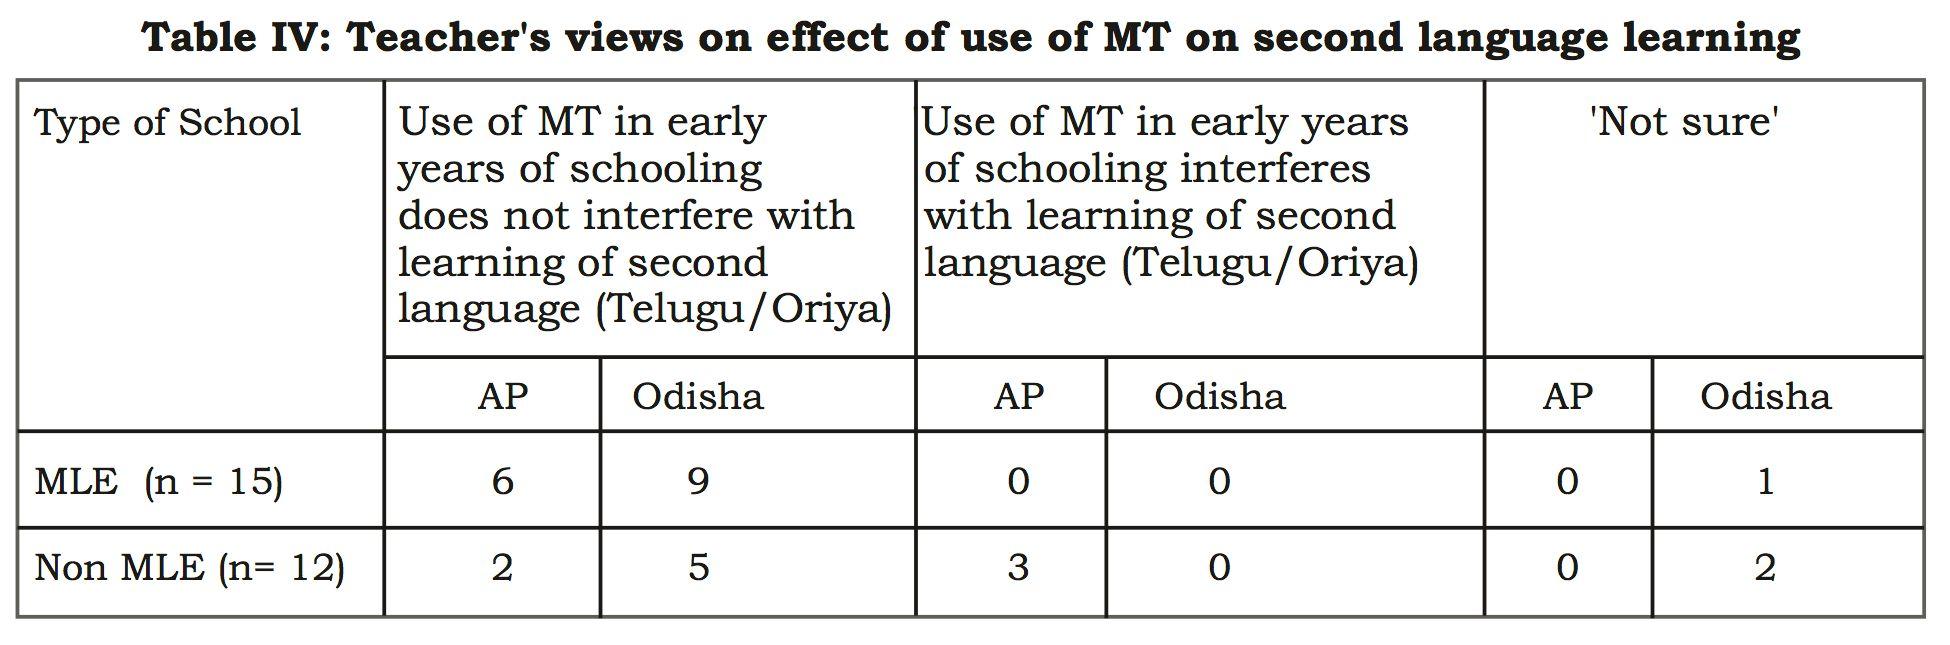 Does MLE Work in Andhra Pradesh and Odisha? A Longitudinal